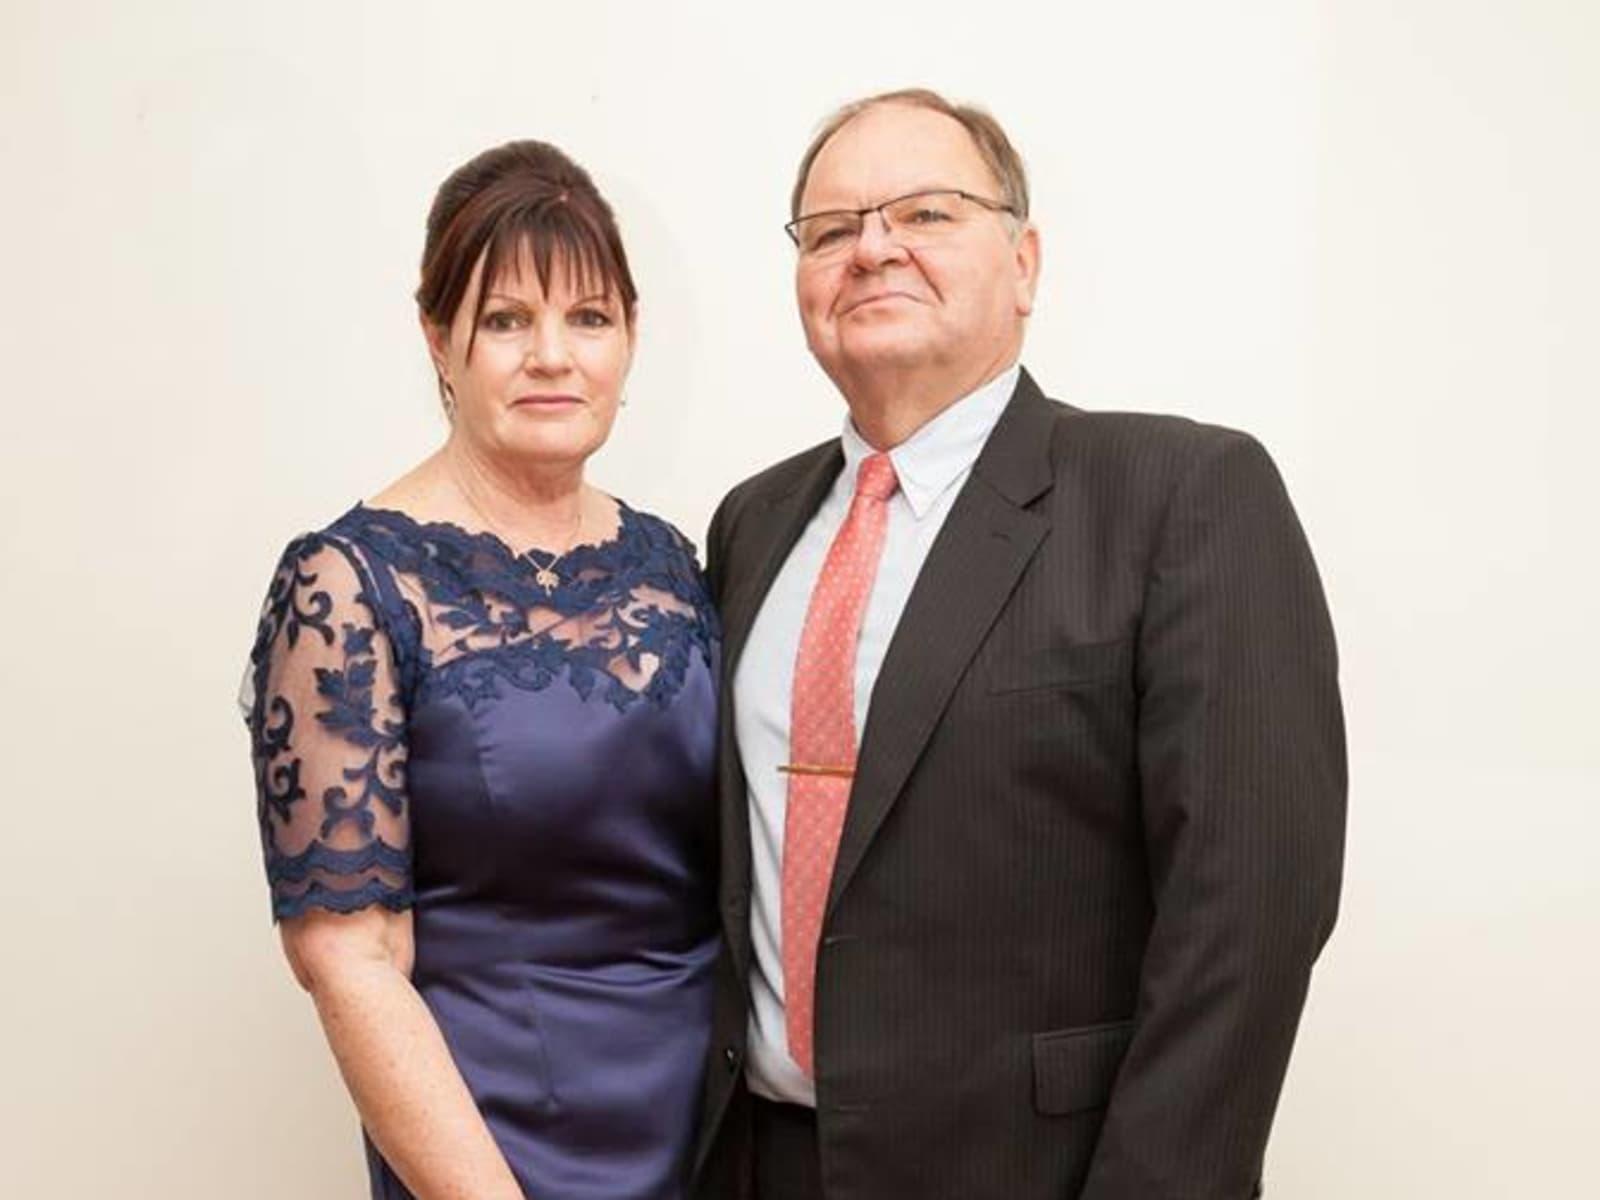 Greg & Sharon from Bendigo, Victoria, Australia